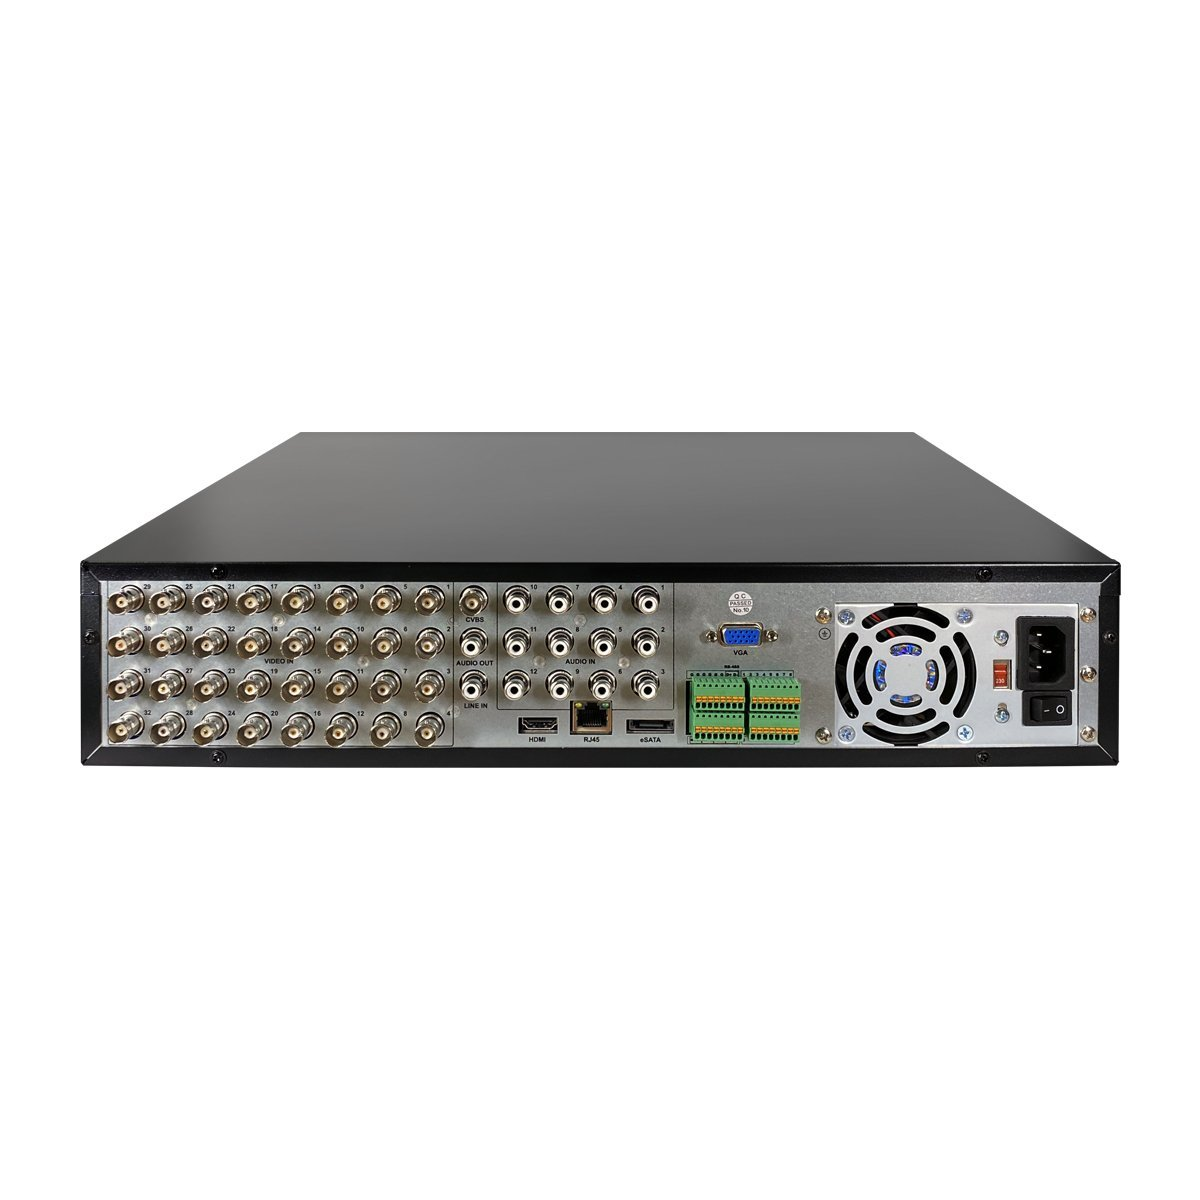 XVR 4K 32 Canali 5in1 - Cloud - 8Mpx - 16 Ingressi Allarme